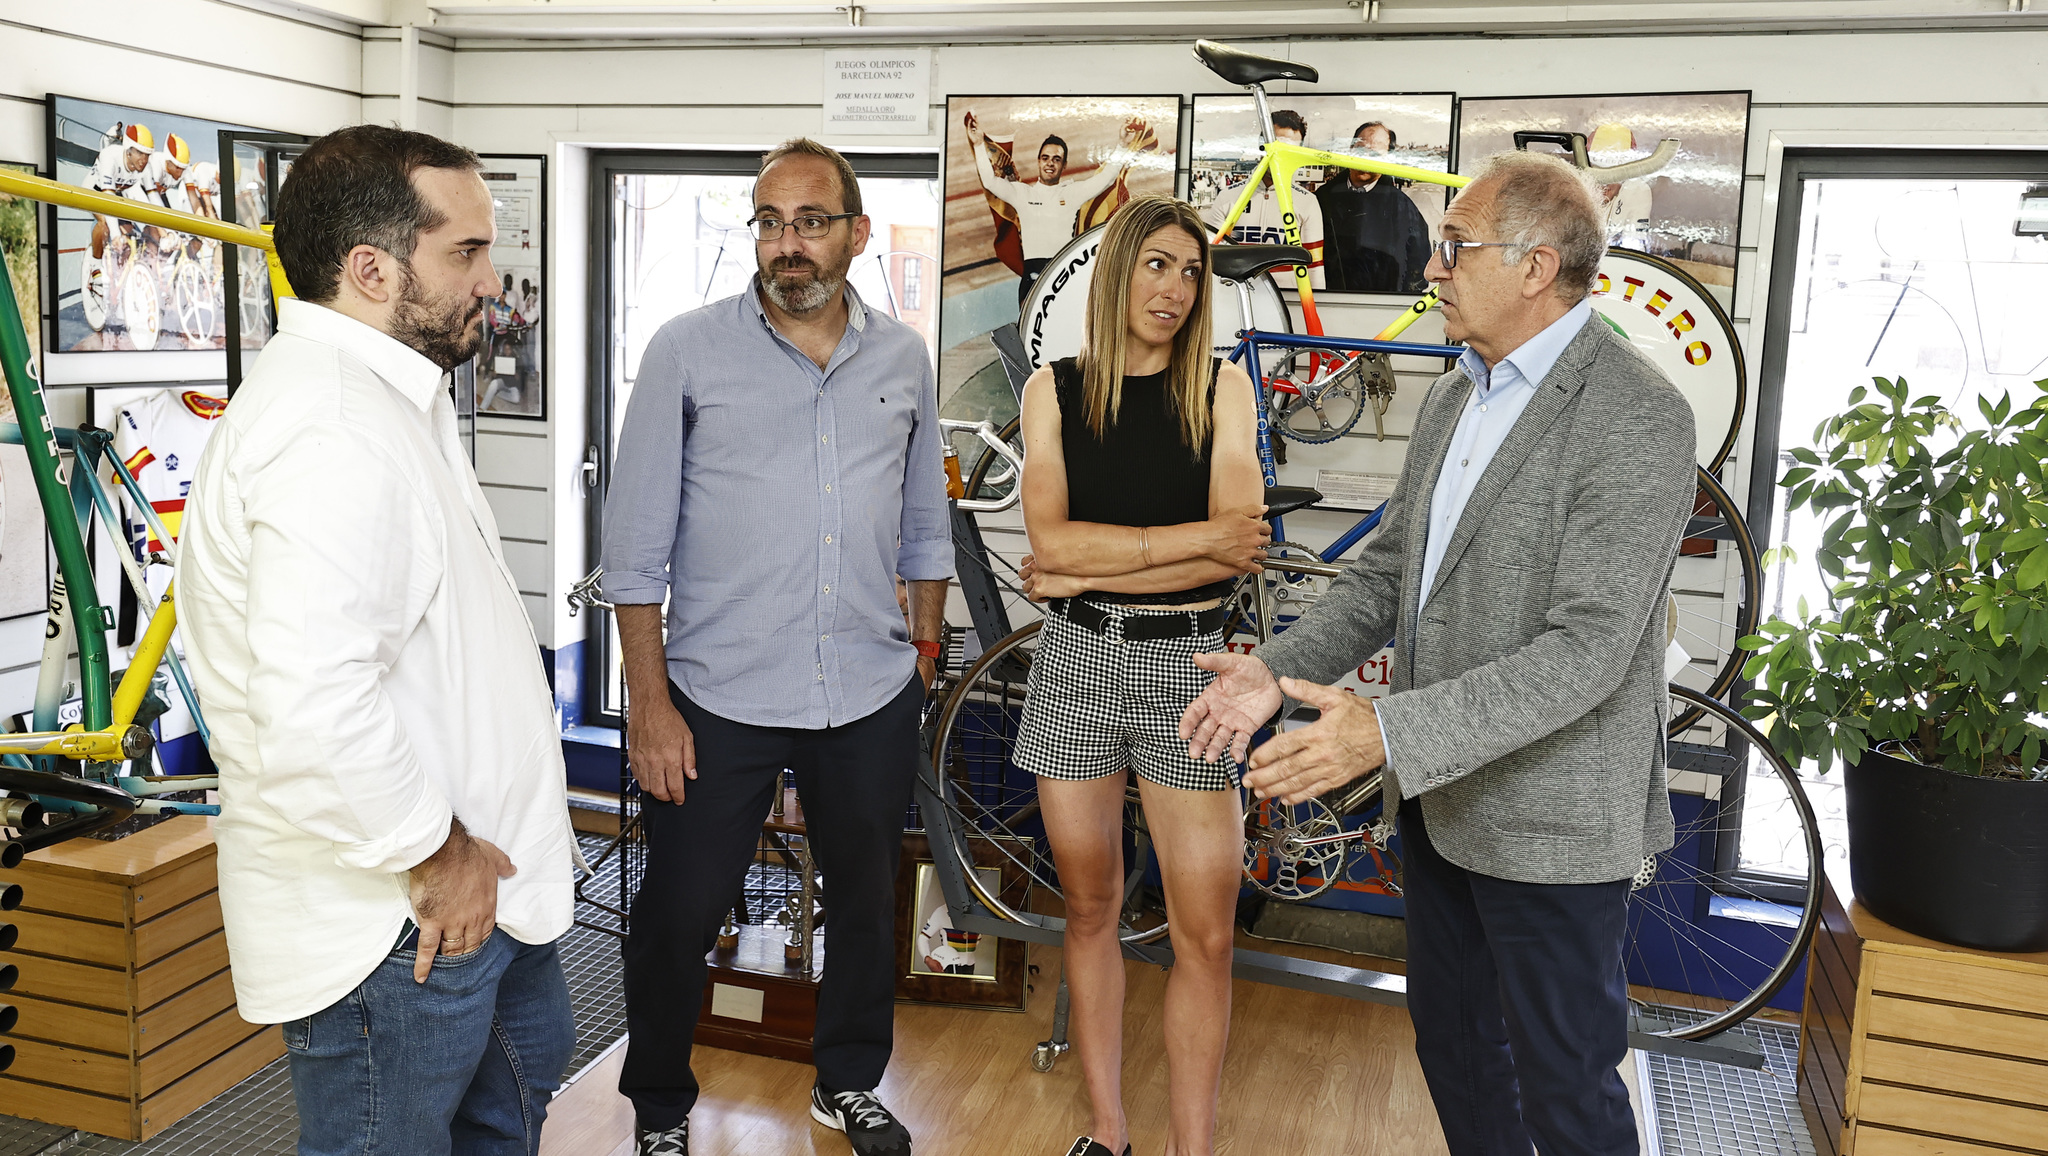 SERIAL JJOO CICLISMO EN LA TIENDA DE BICICLETAS lt;HIT gt;OTERO lt;/HIT gt; DE MADRID